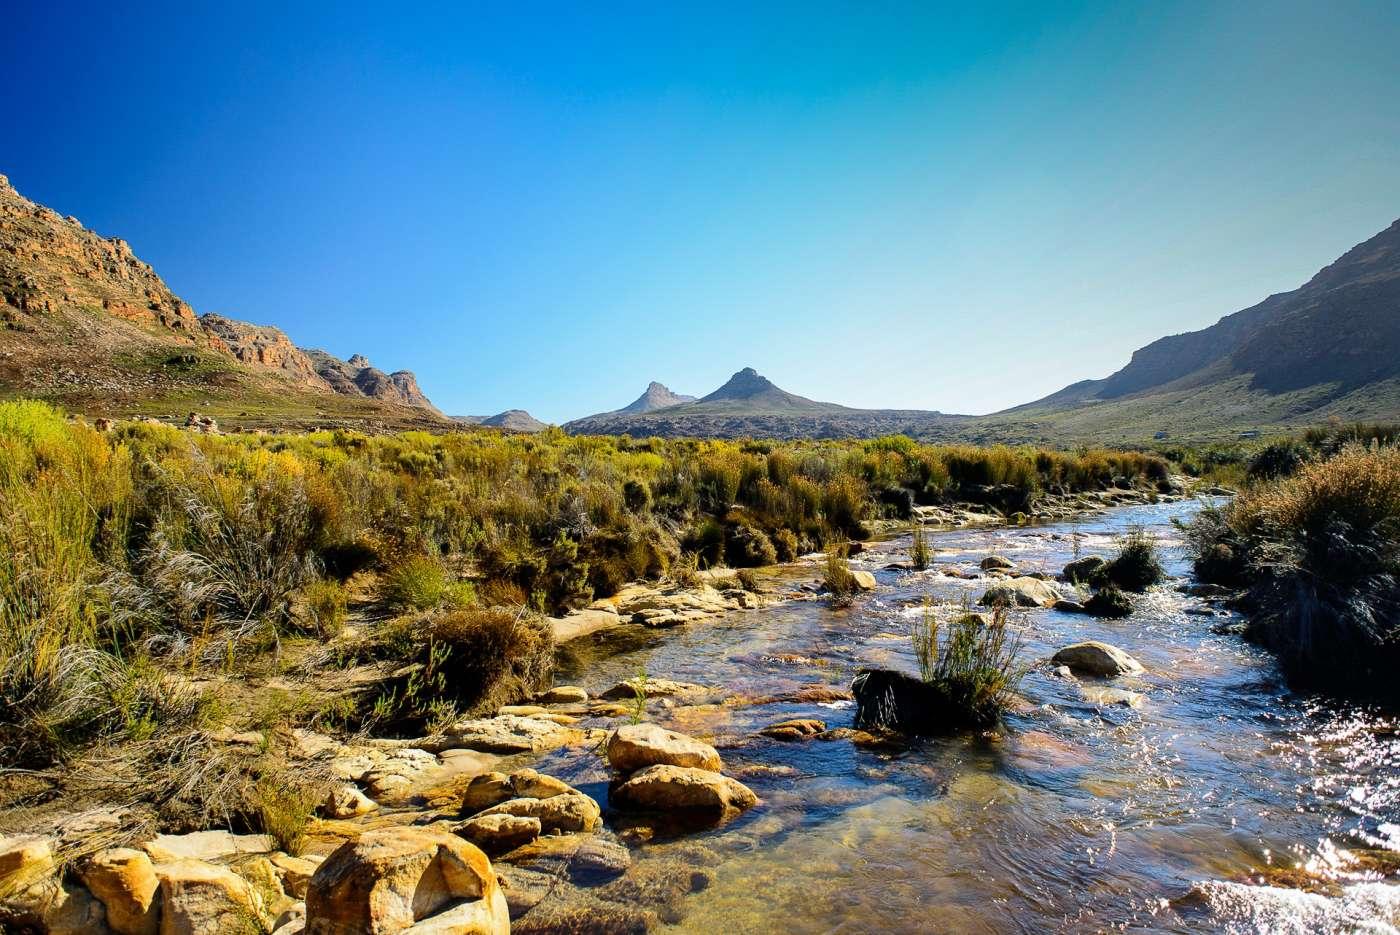 sud-africain mode de vie datant